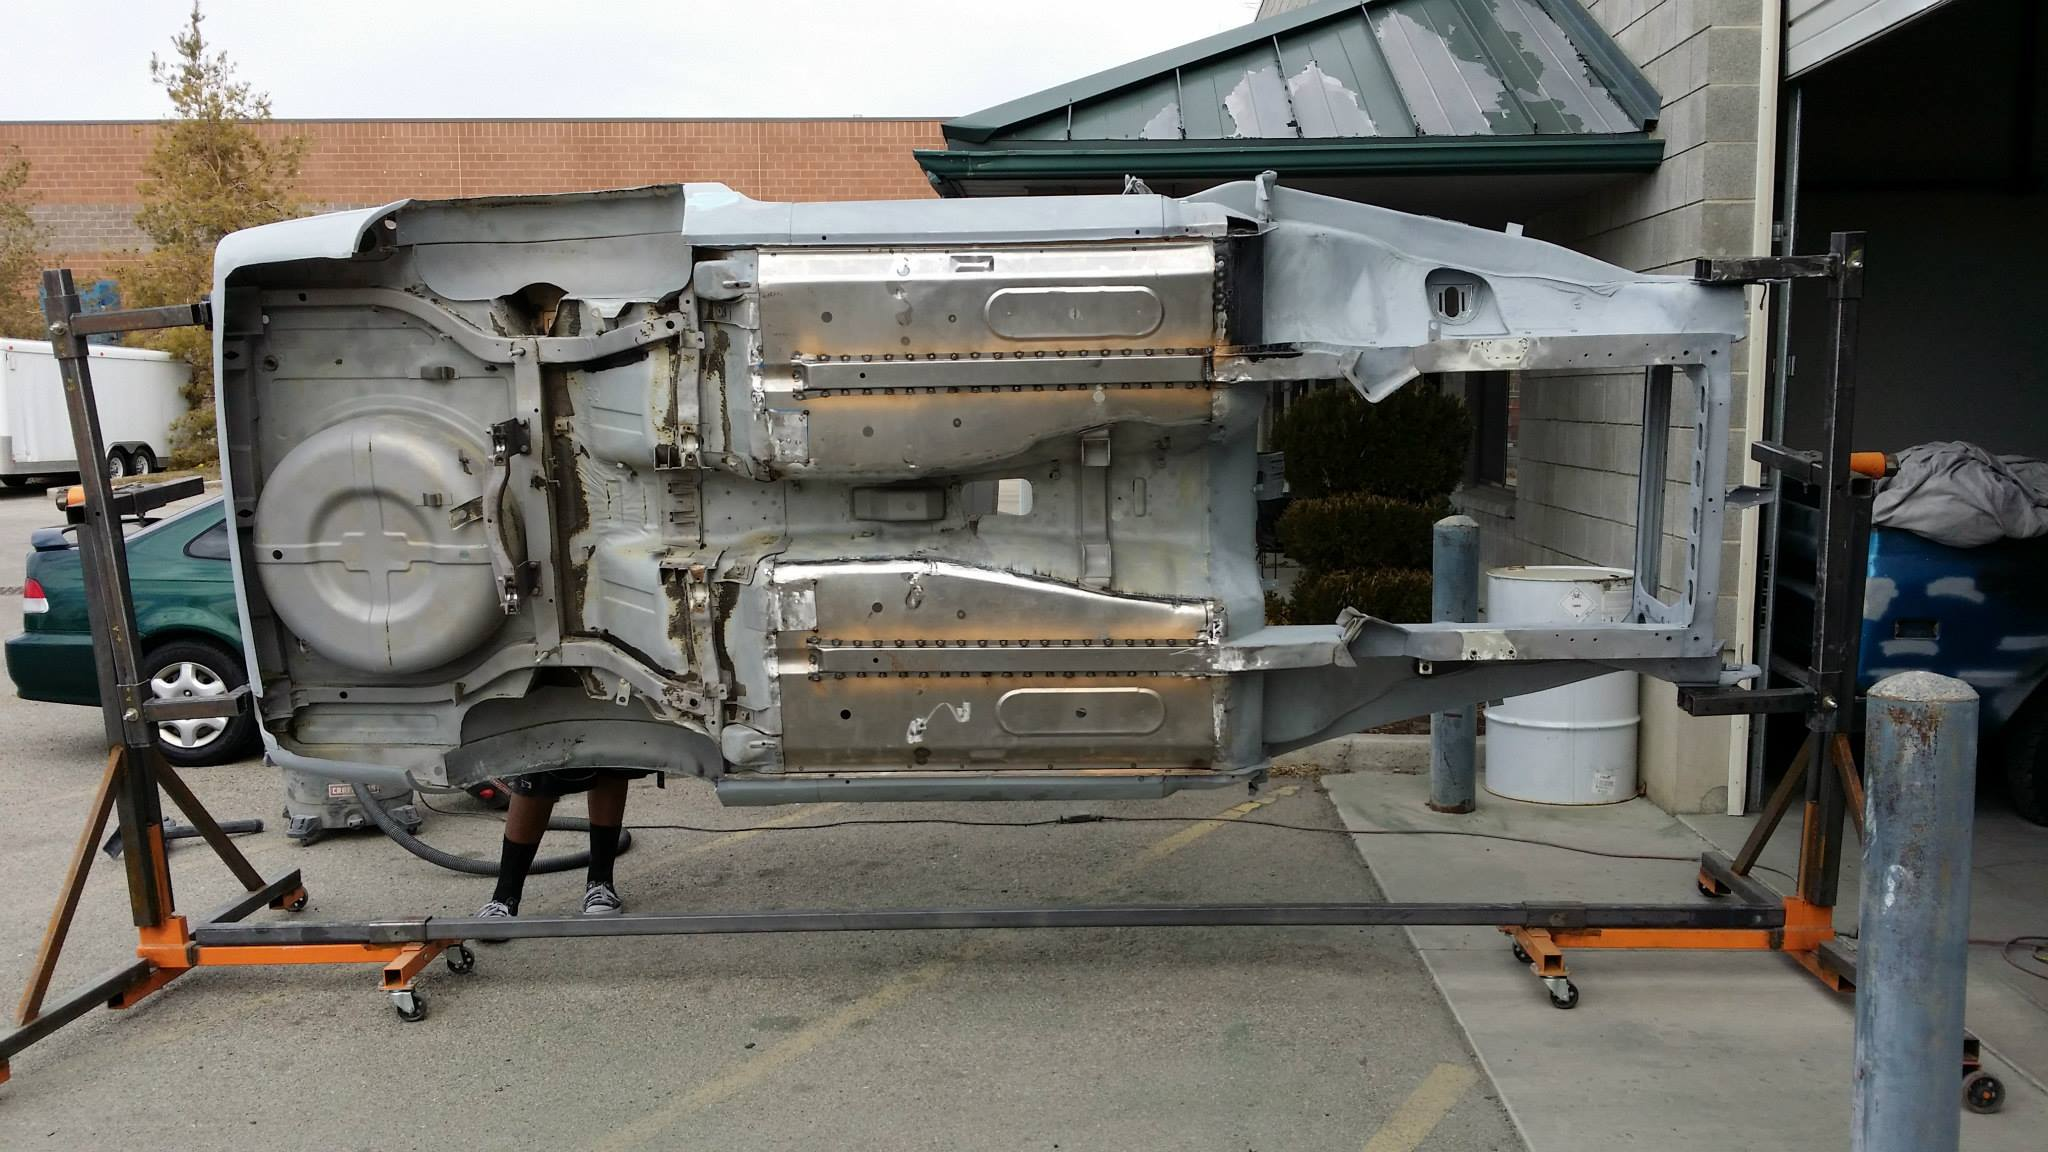 Datsun 240z With A 3 2 L Inline Six Engine Swap Depot